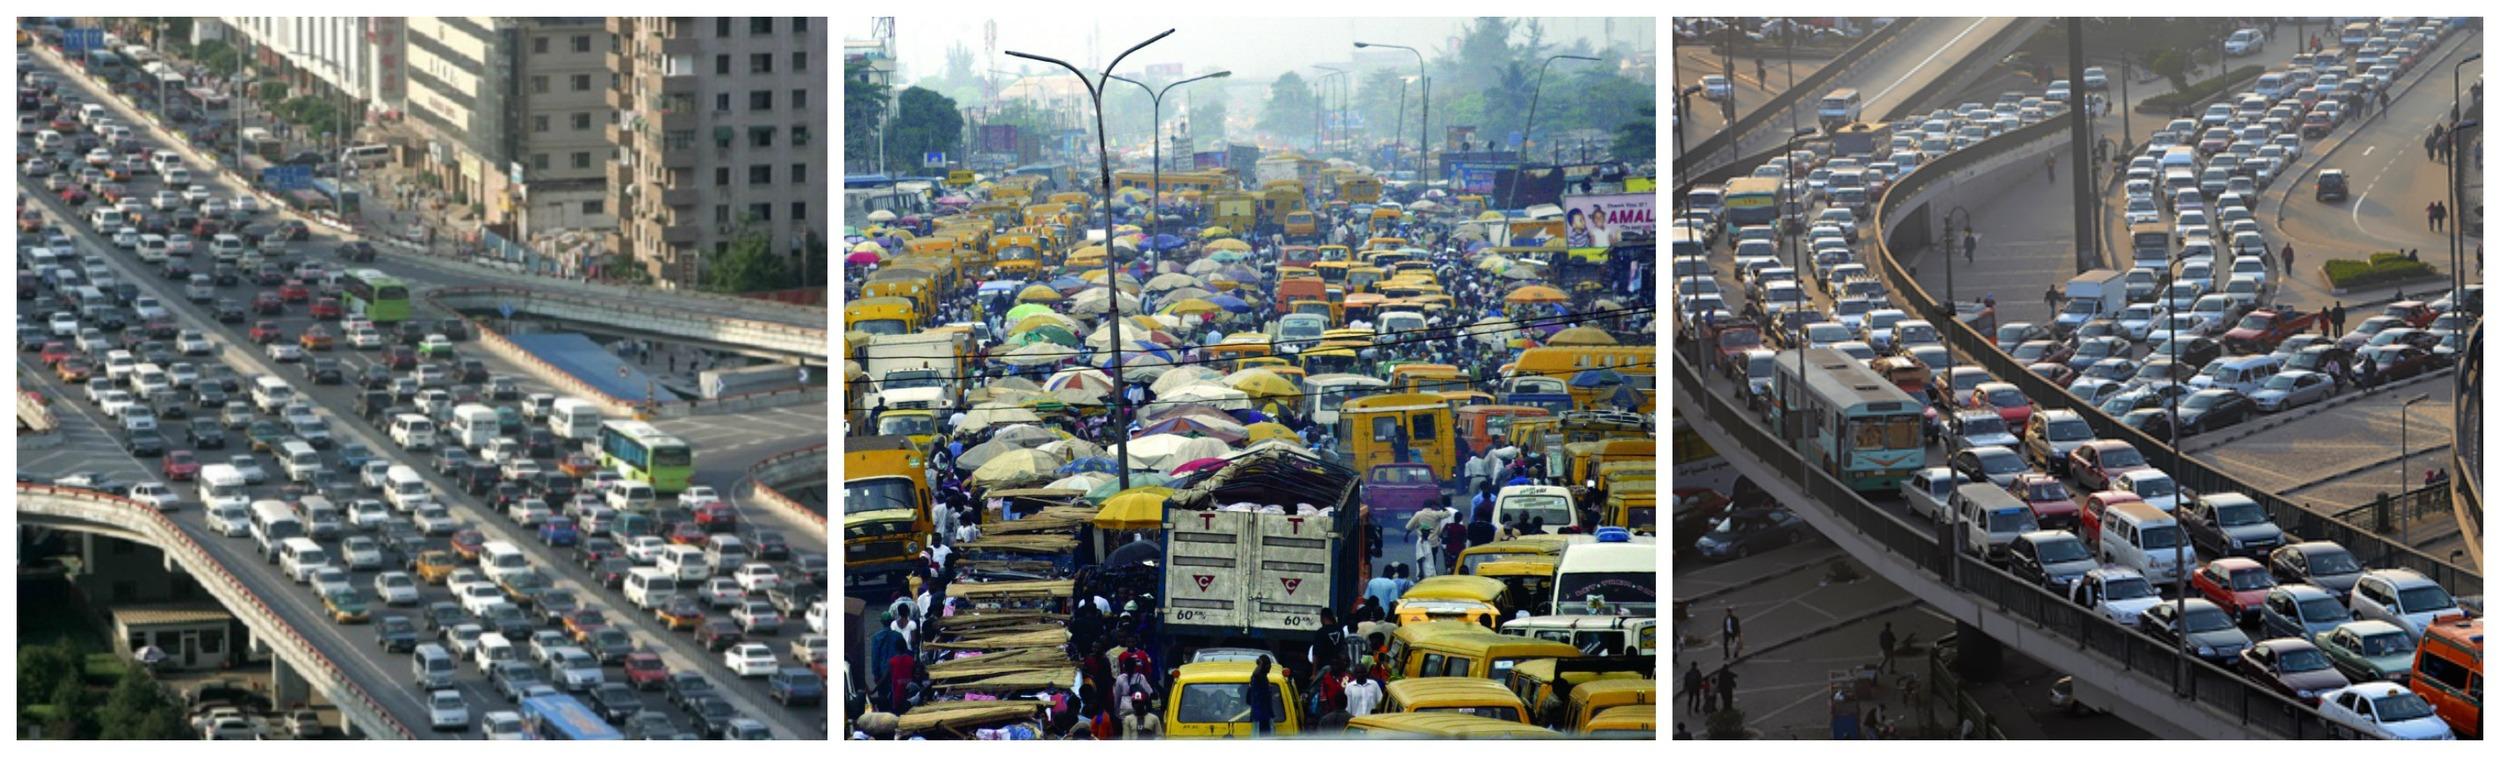 African traffic jams: Johannesburg, Lagos & Nairobi